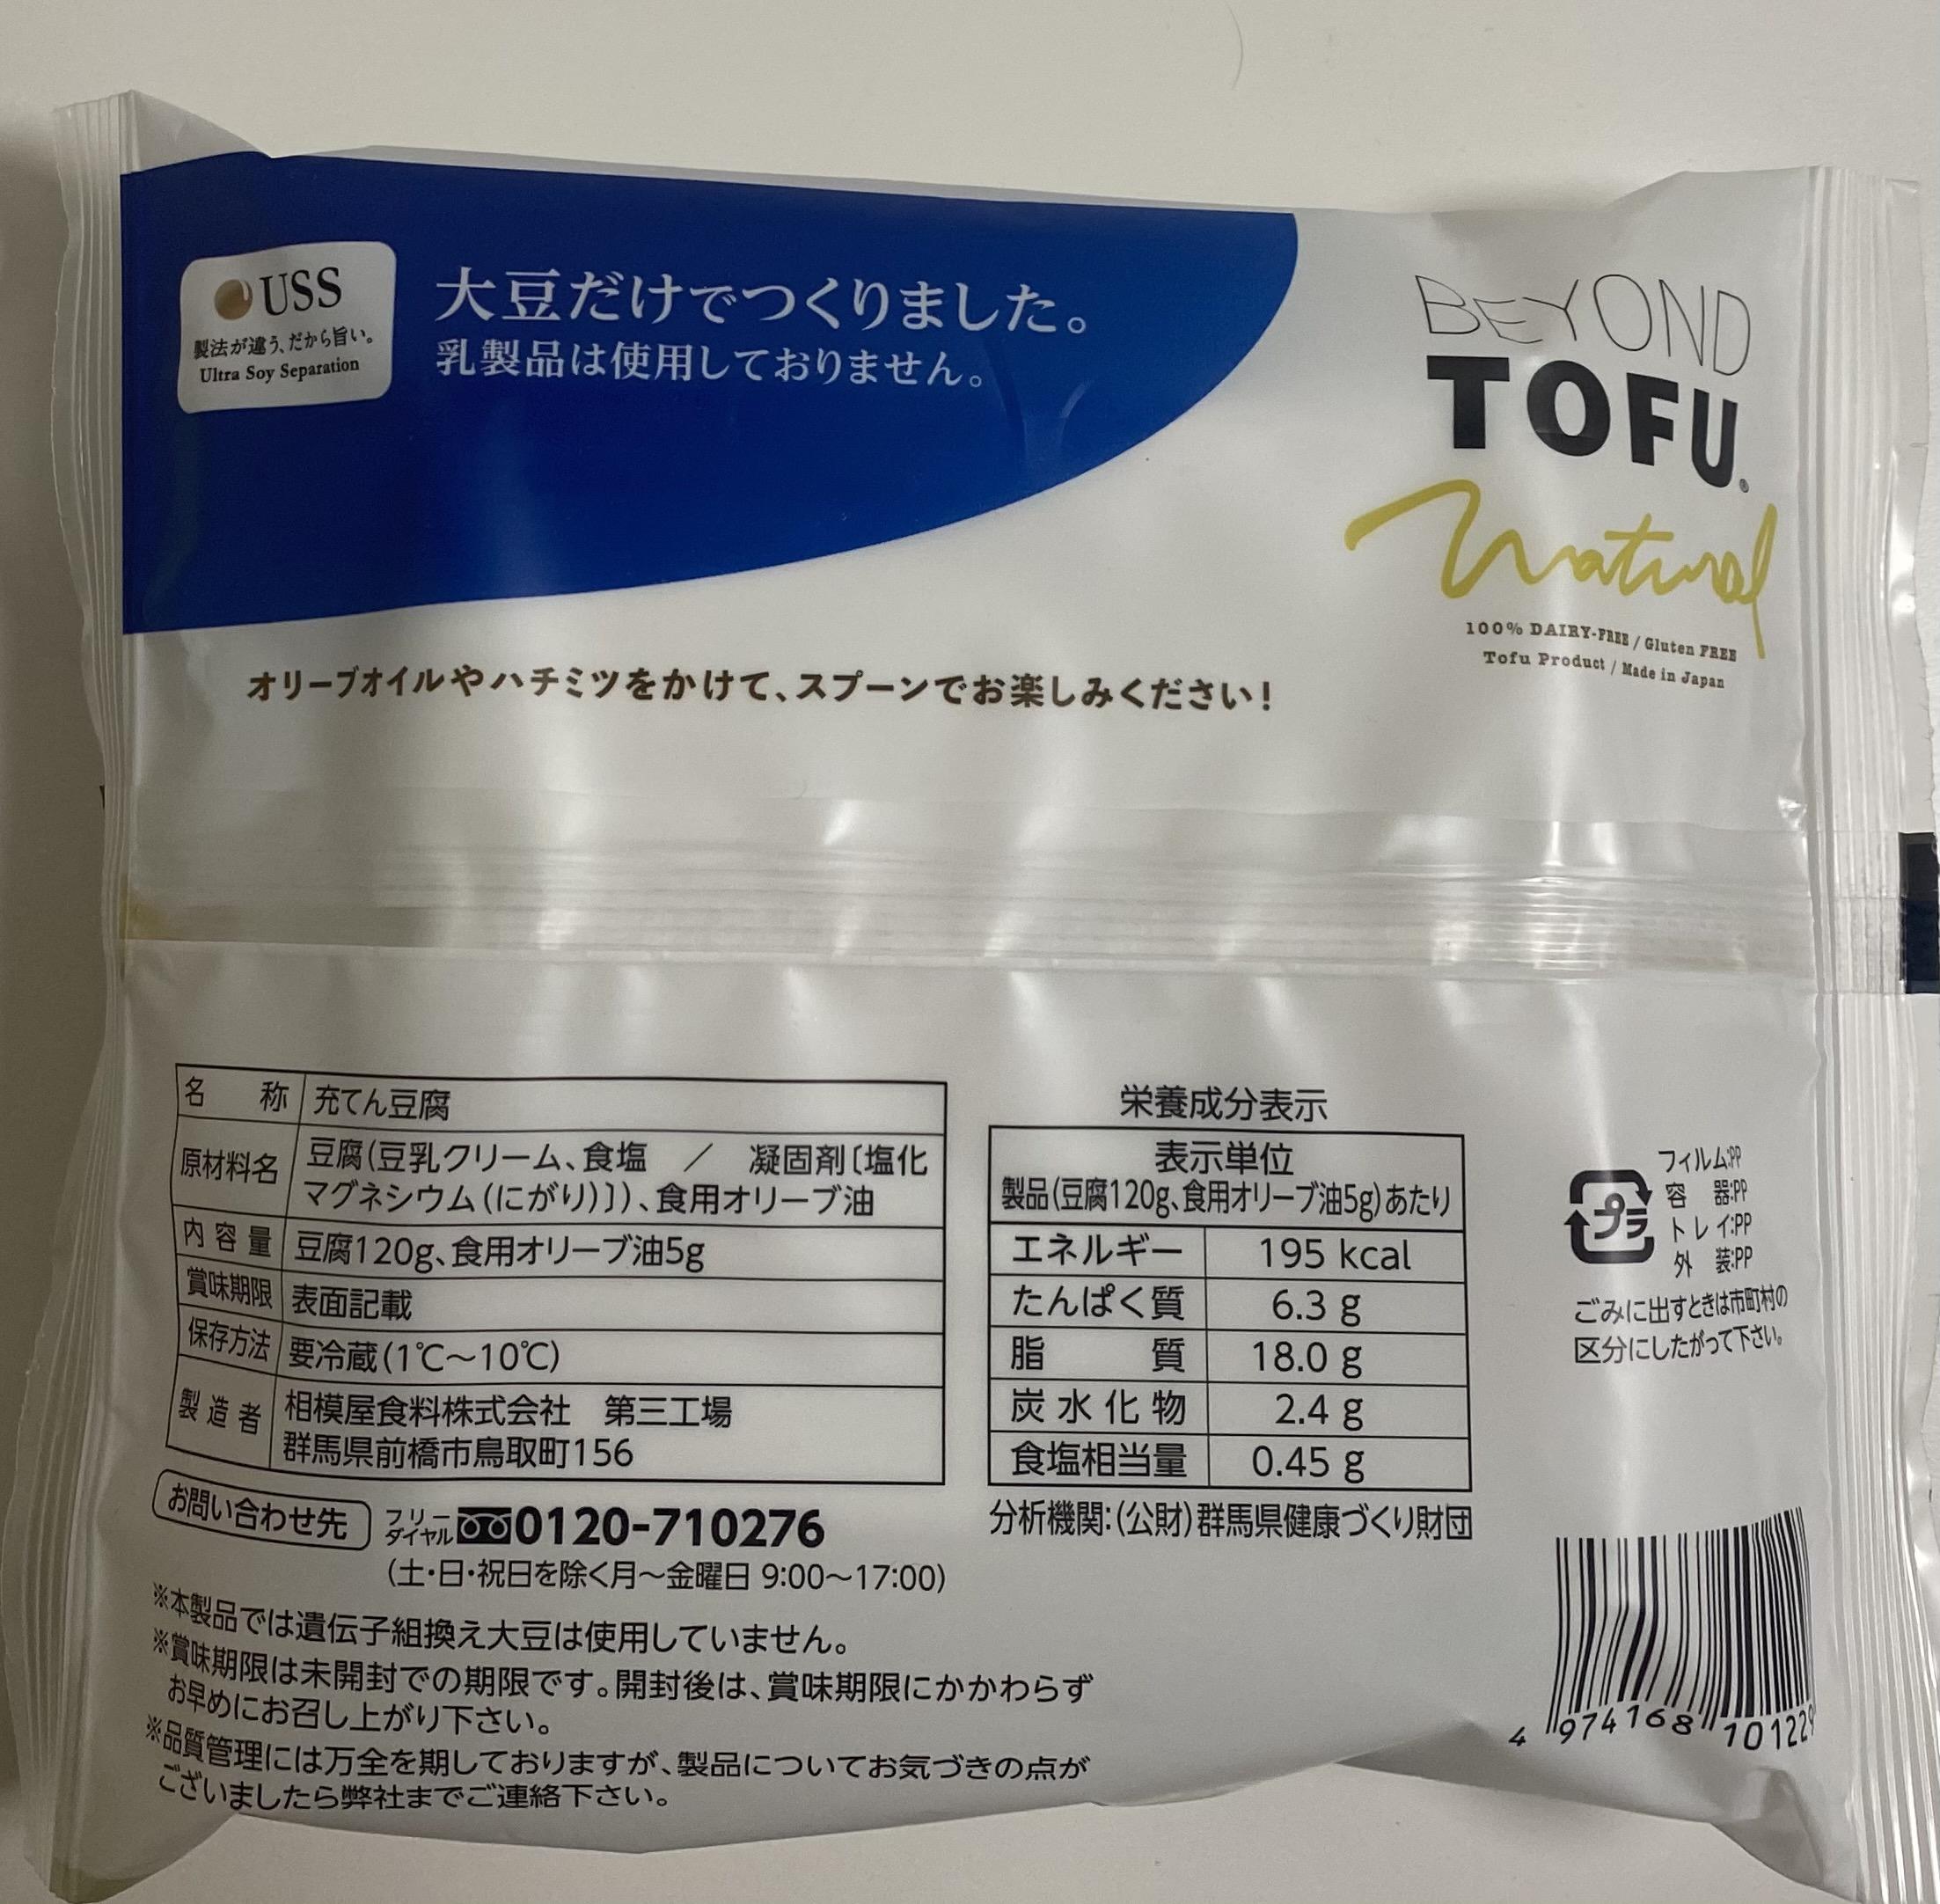 Sagamiya Beyond Tofu Natural back of package